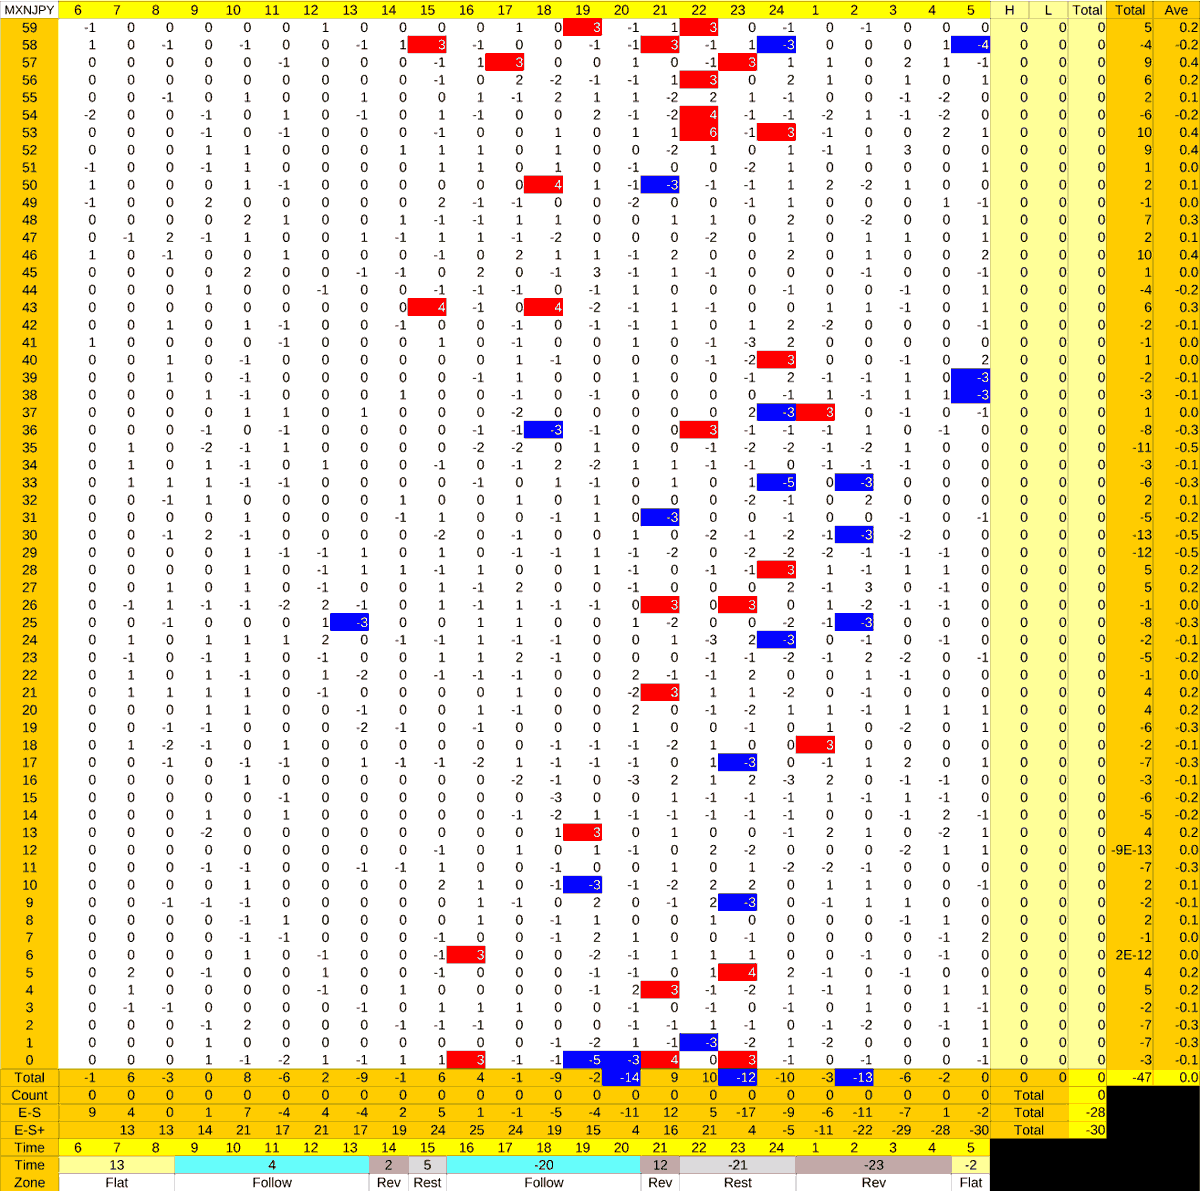 20210420_HS(3)MXNJPY